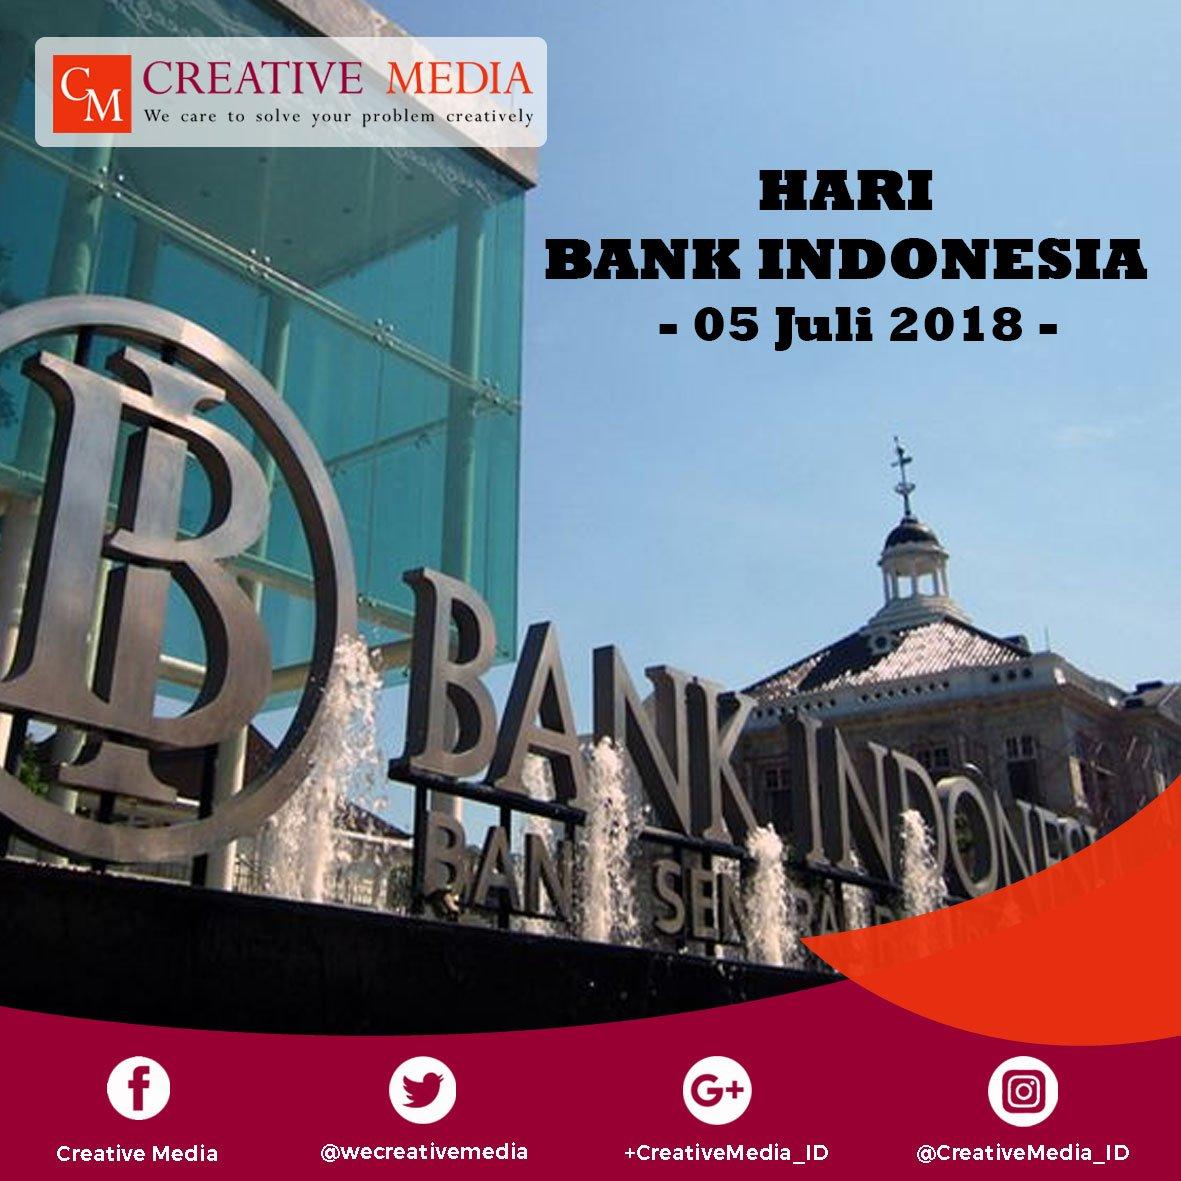 Selamat hari Bank Indonesia 2018  #haribankindonesia #bankindonesia #05juli2018